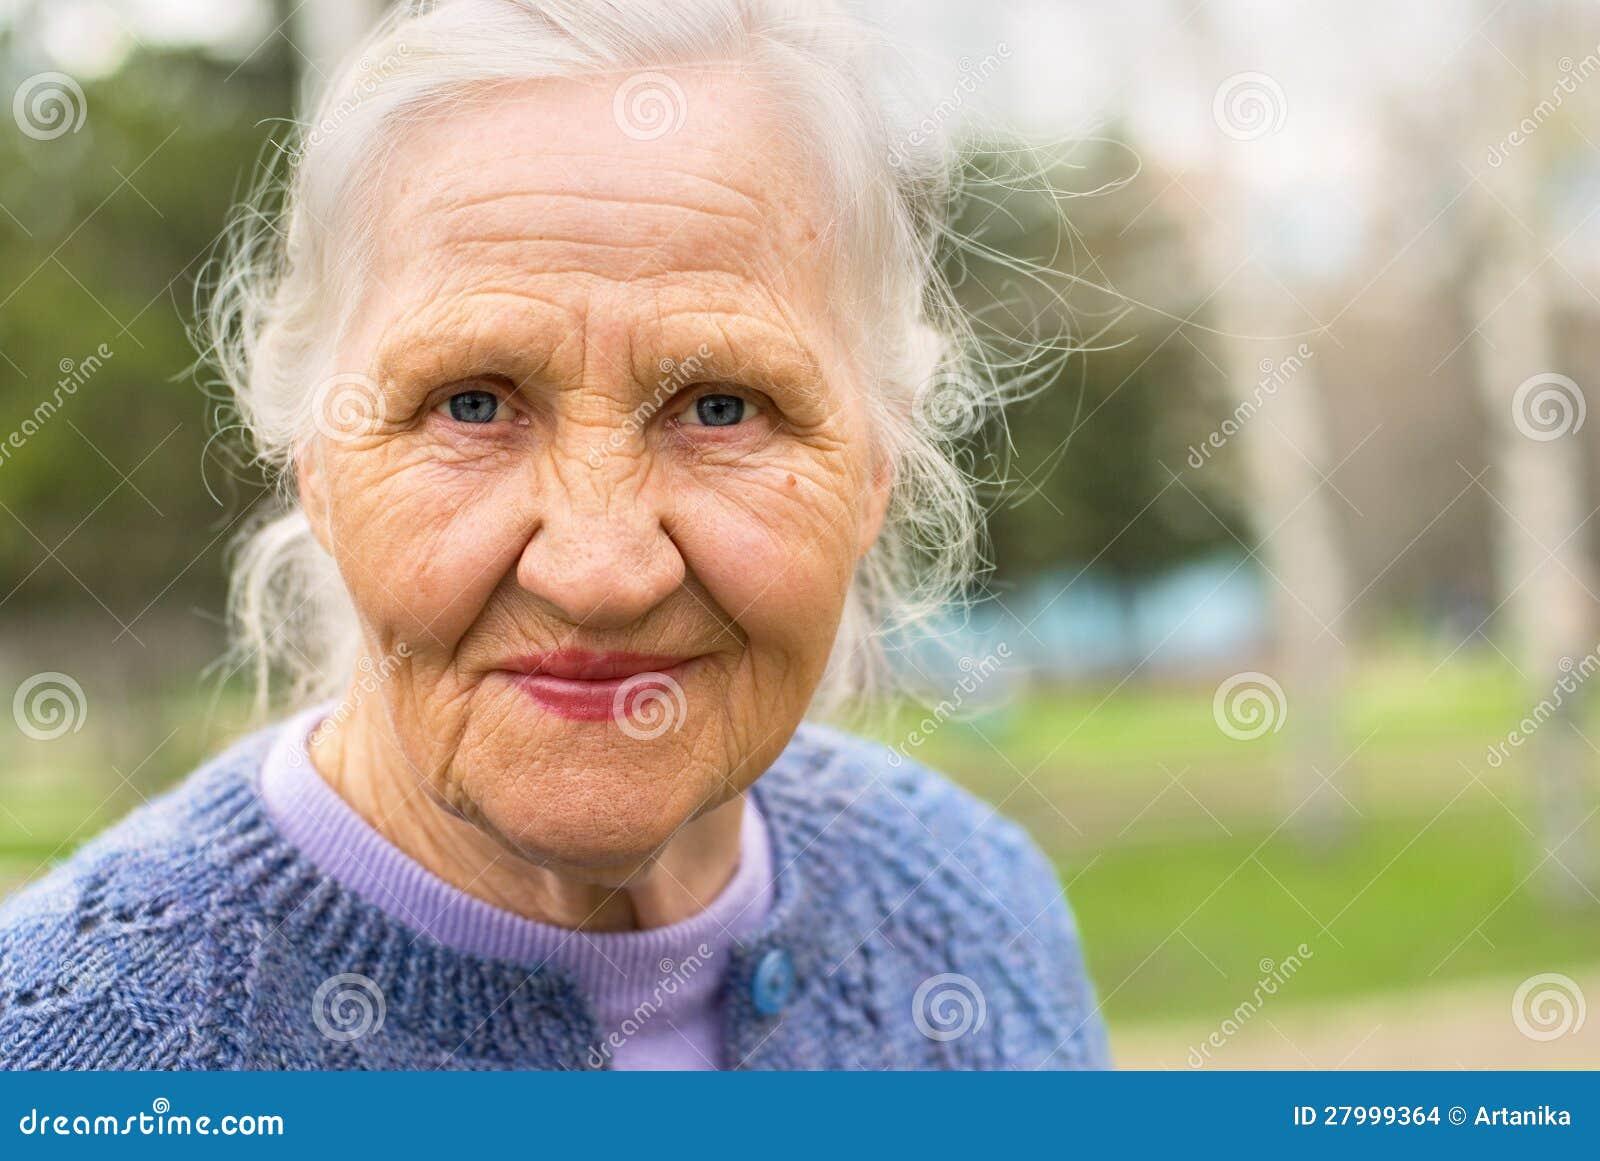 Portrait smiling elderly woman